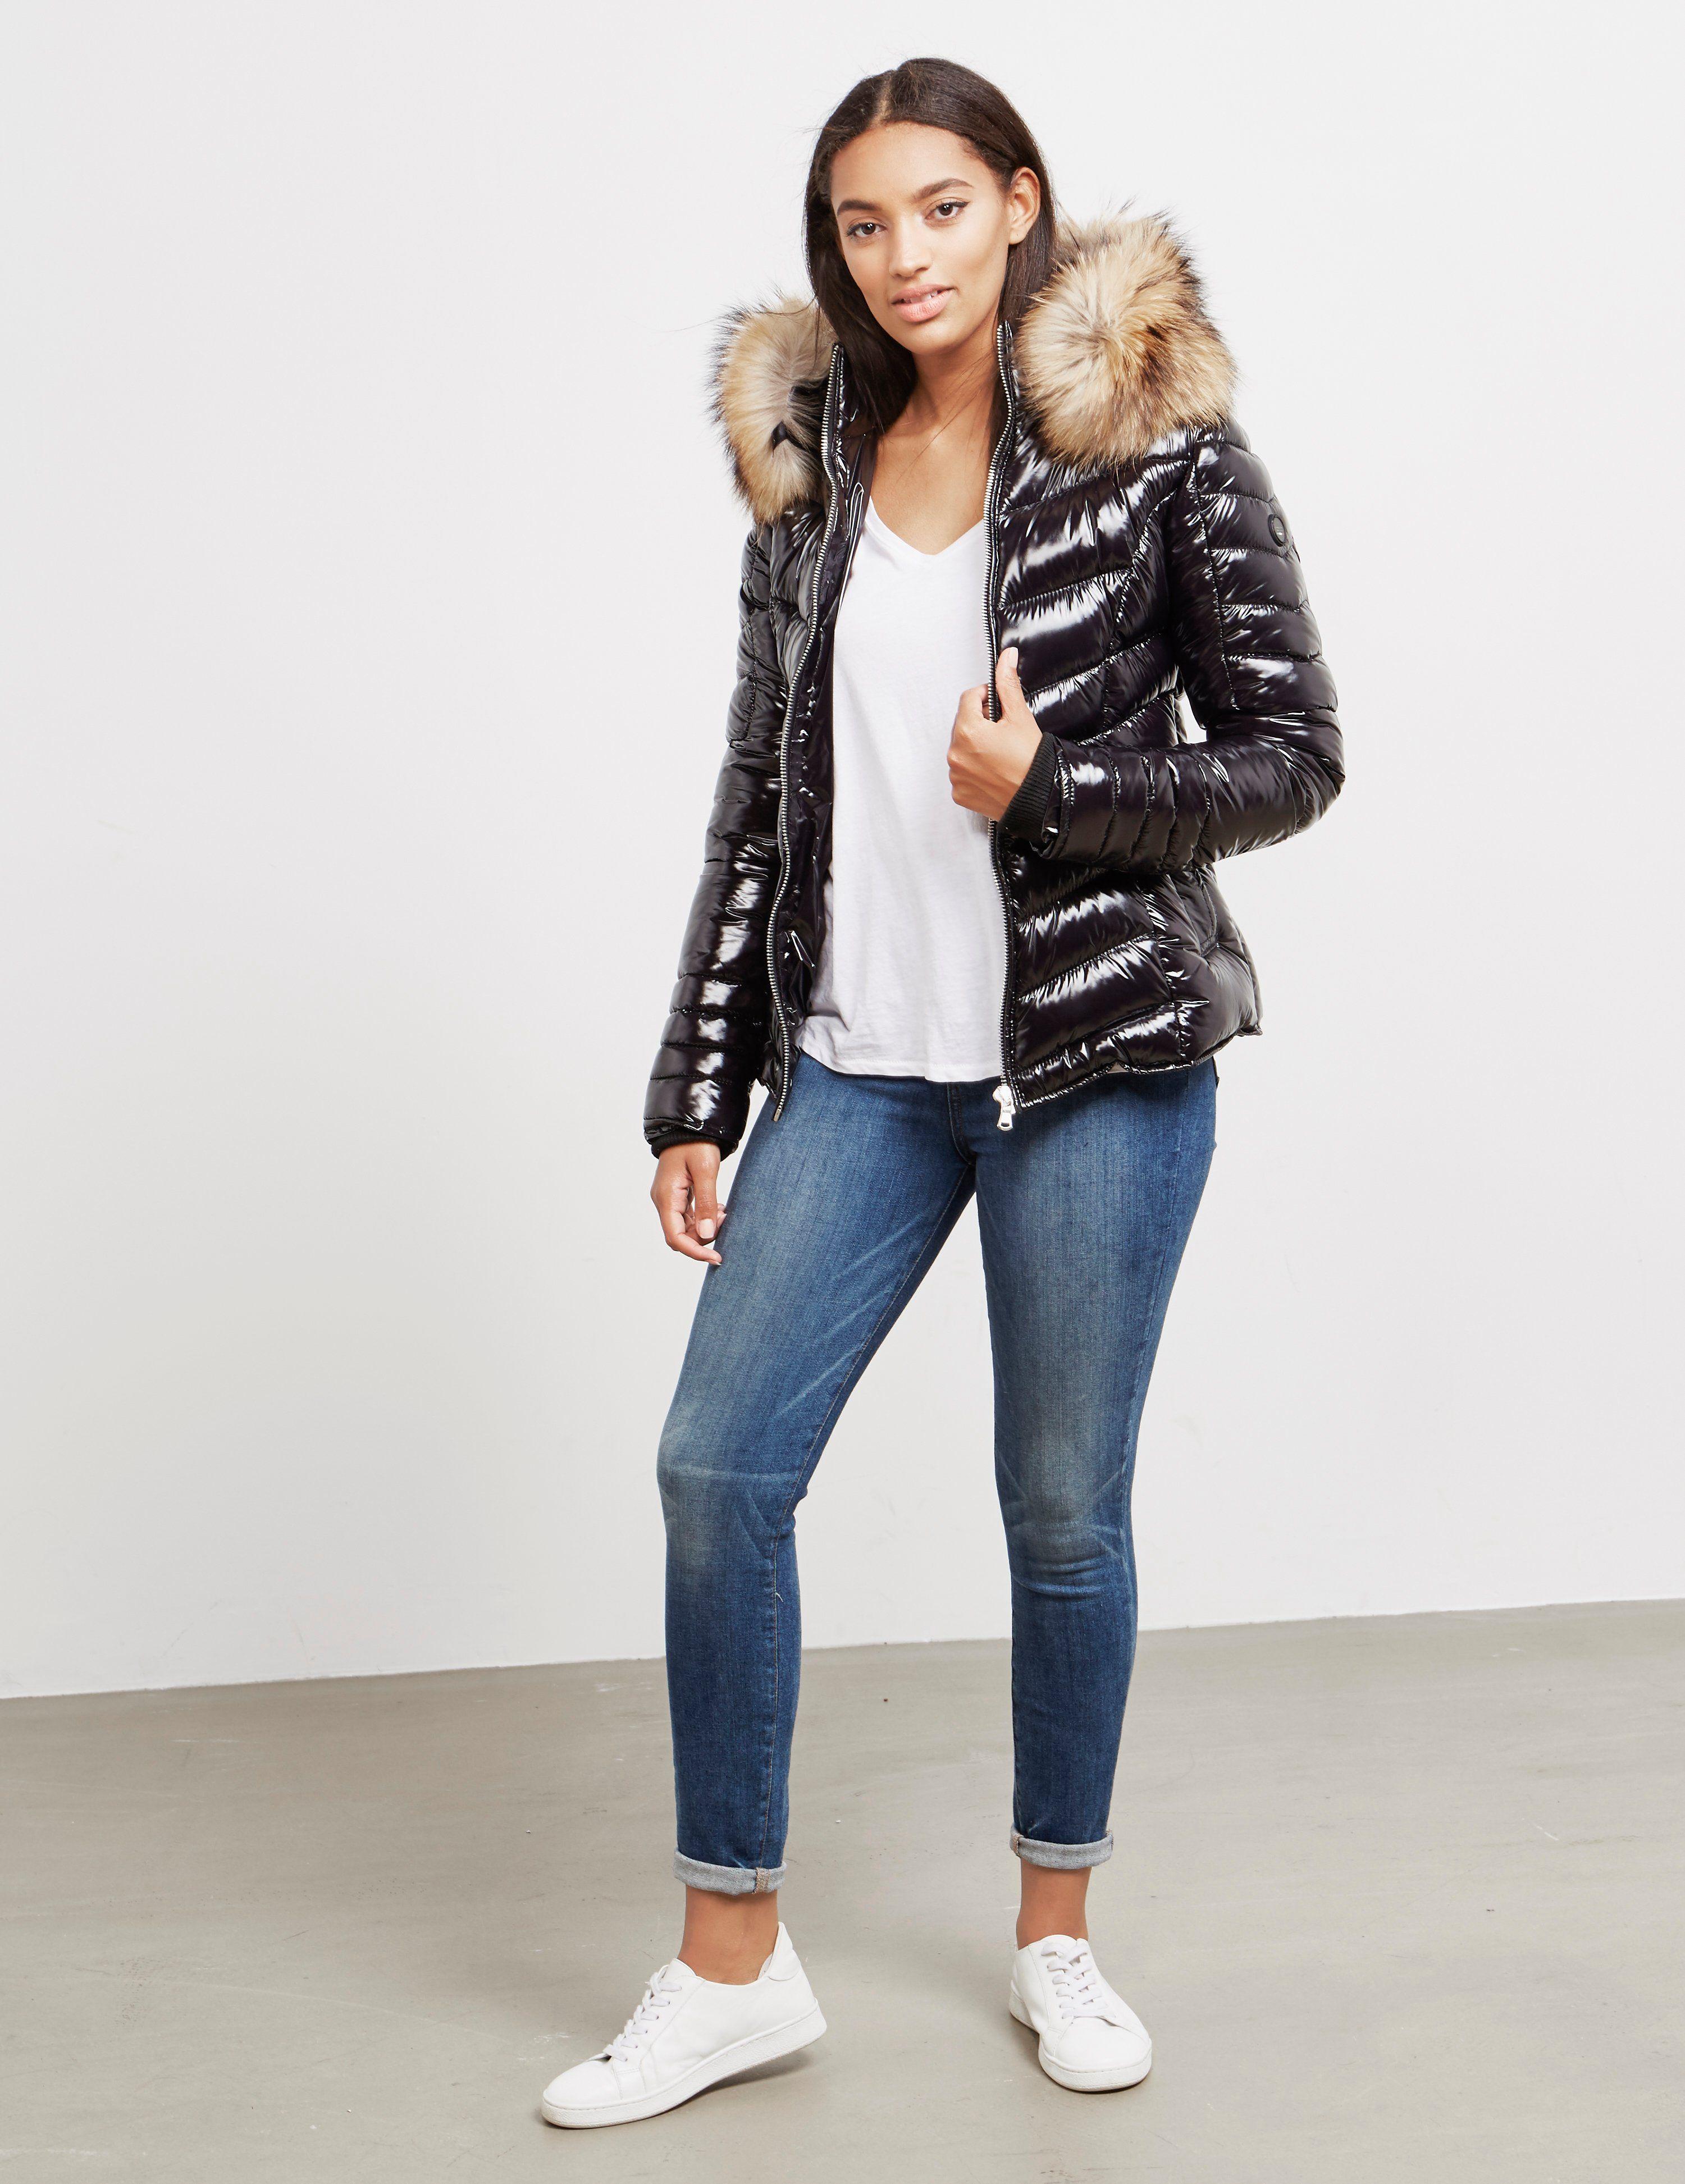 Froccella Glossy Chevron Jacket